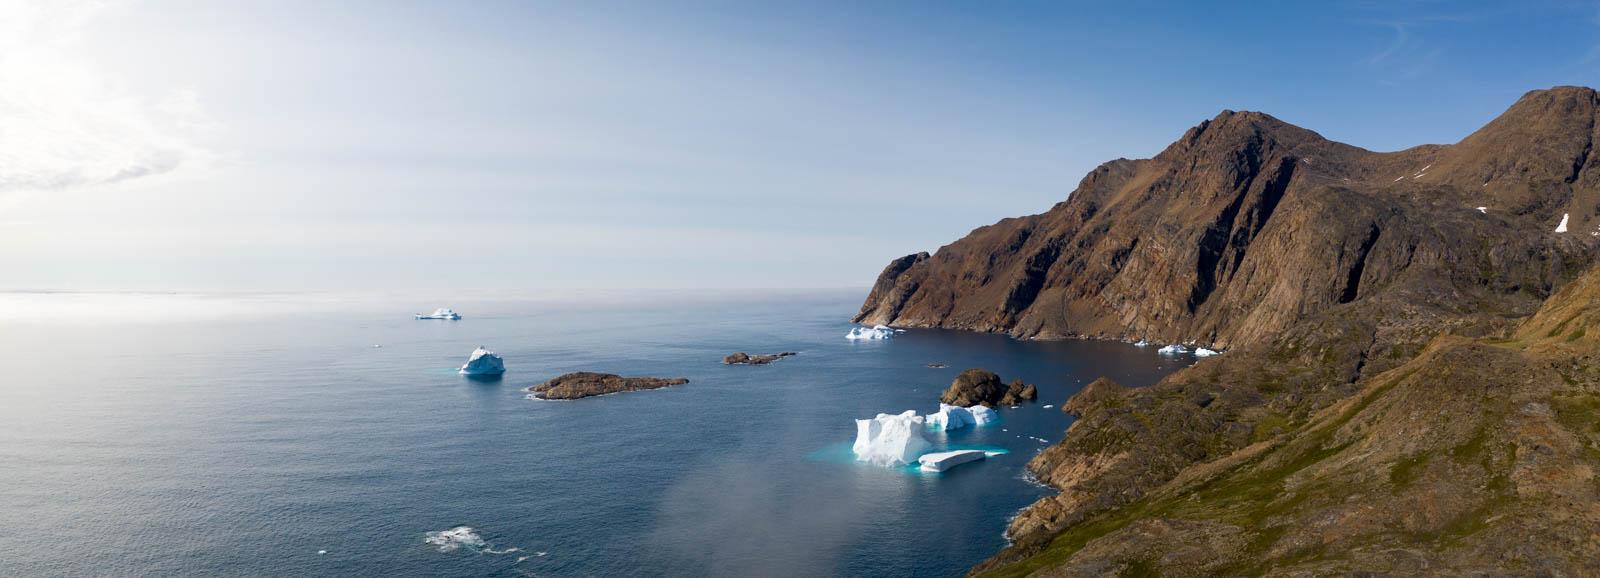 Ostgrönland, Grönland, Tasiilaq, Drohne, Mavic 2 Pro, Panorama